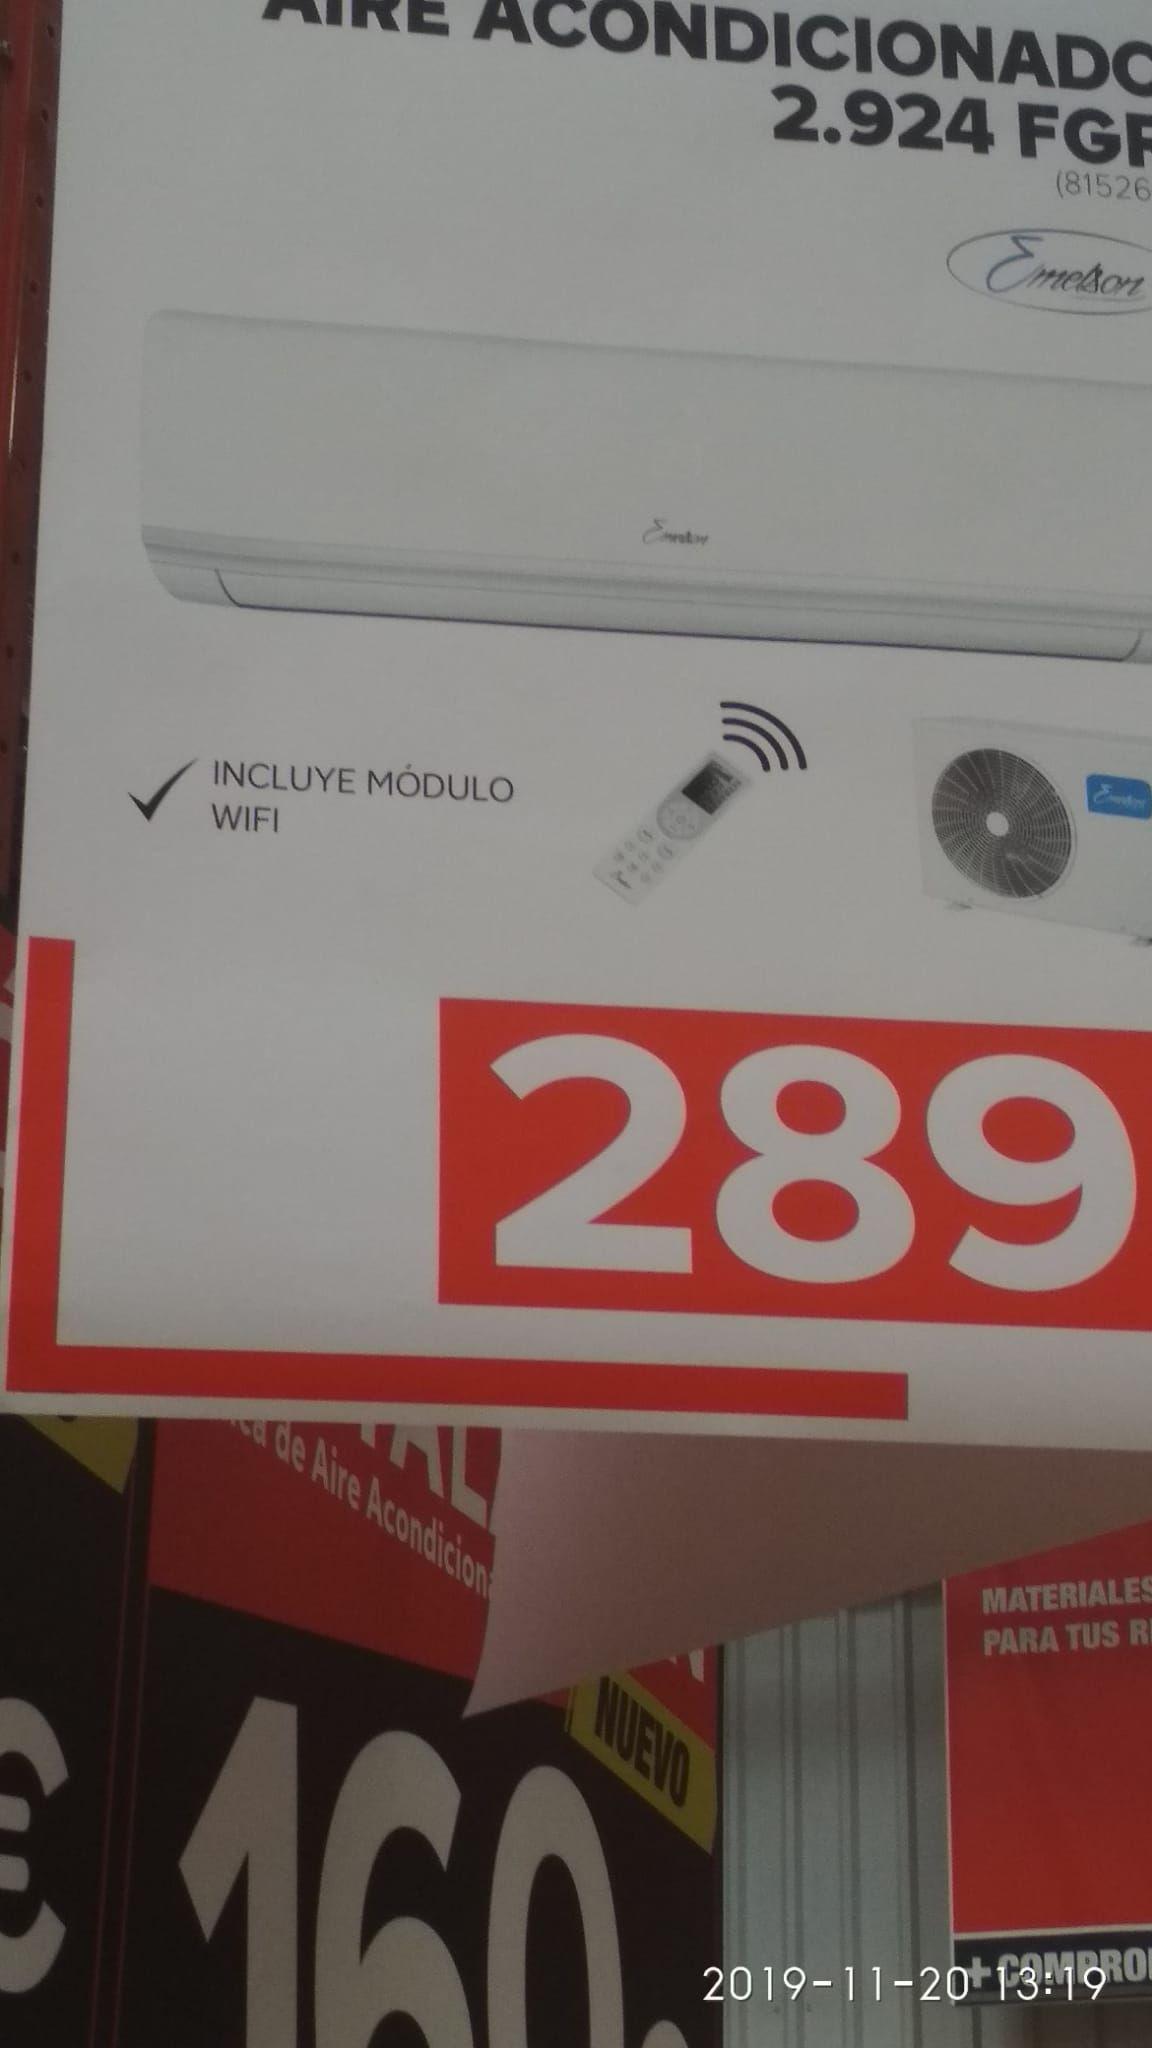 Aire acondicionado 3000frigorias +módulo wifi (Bricodepot de Alcalá de henares)